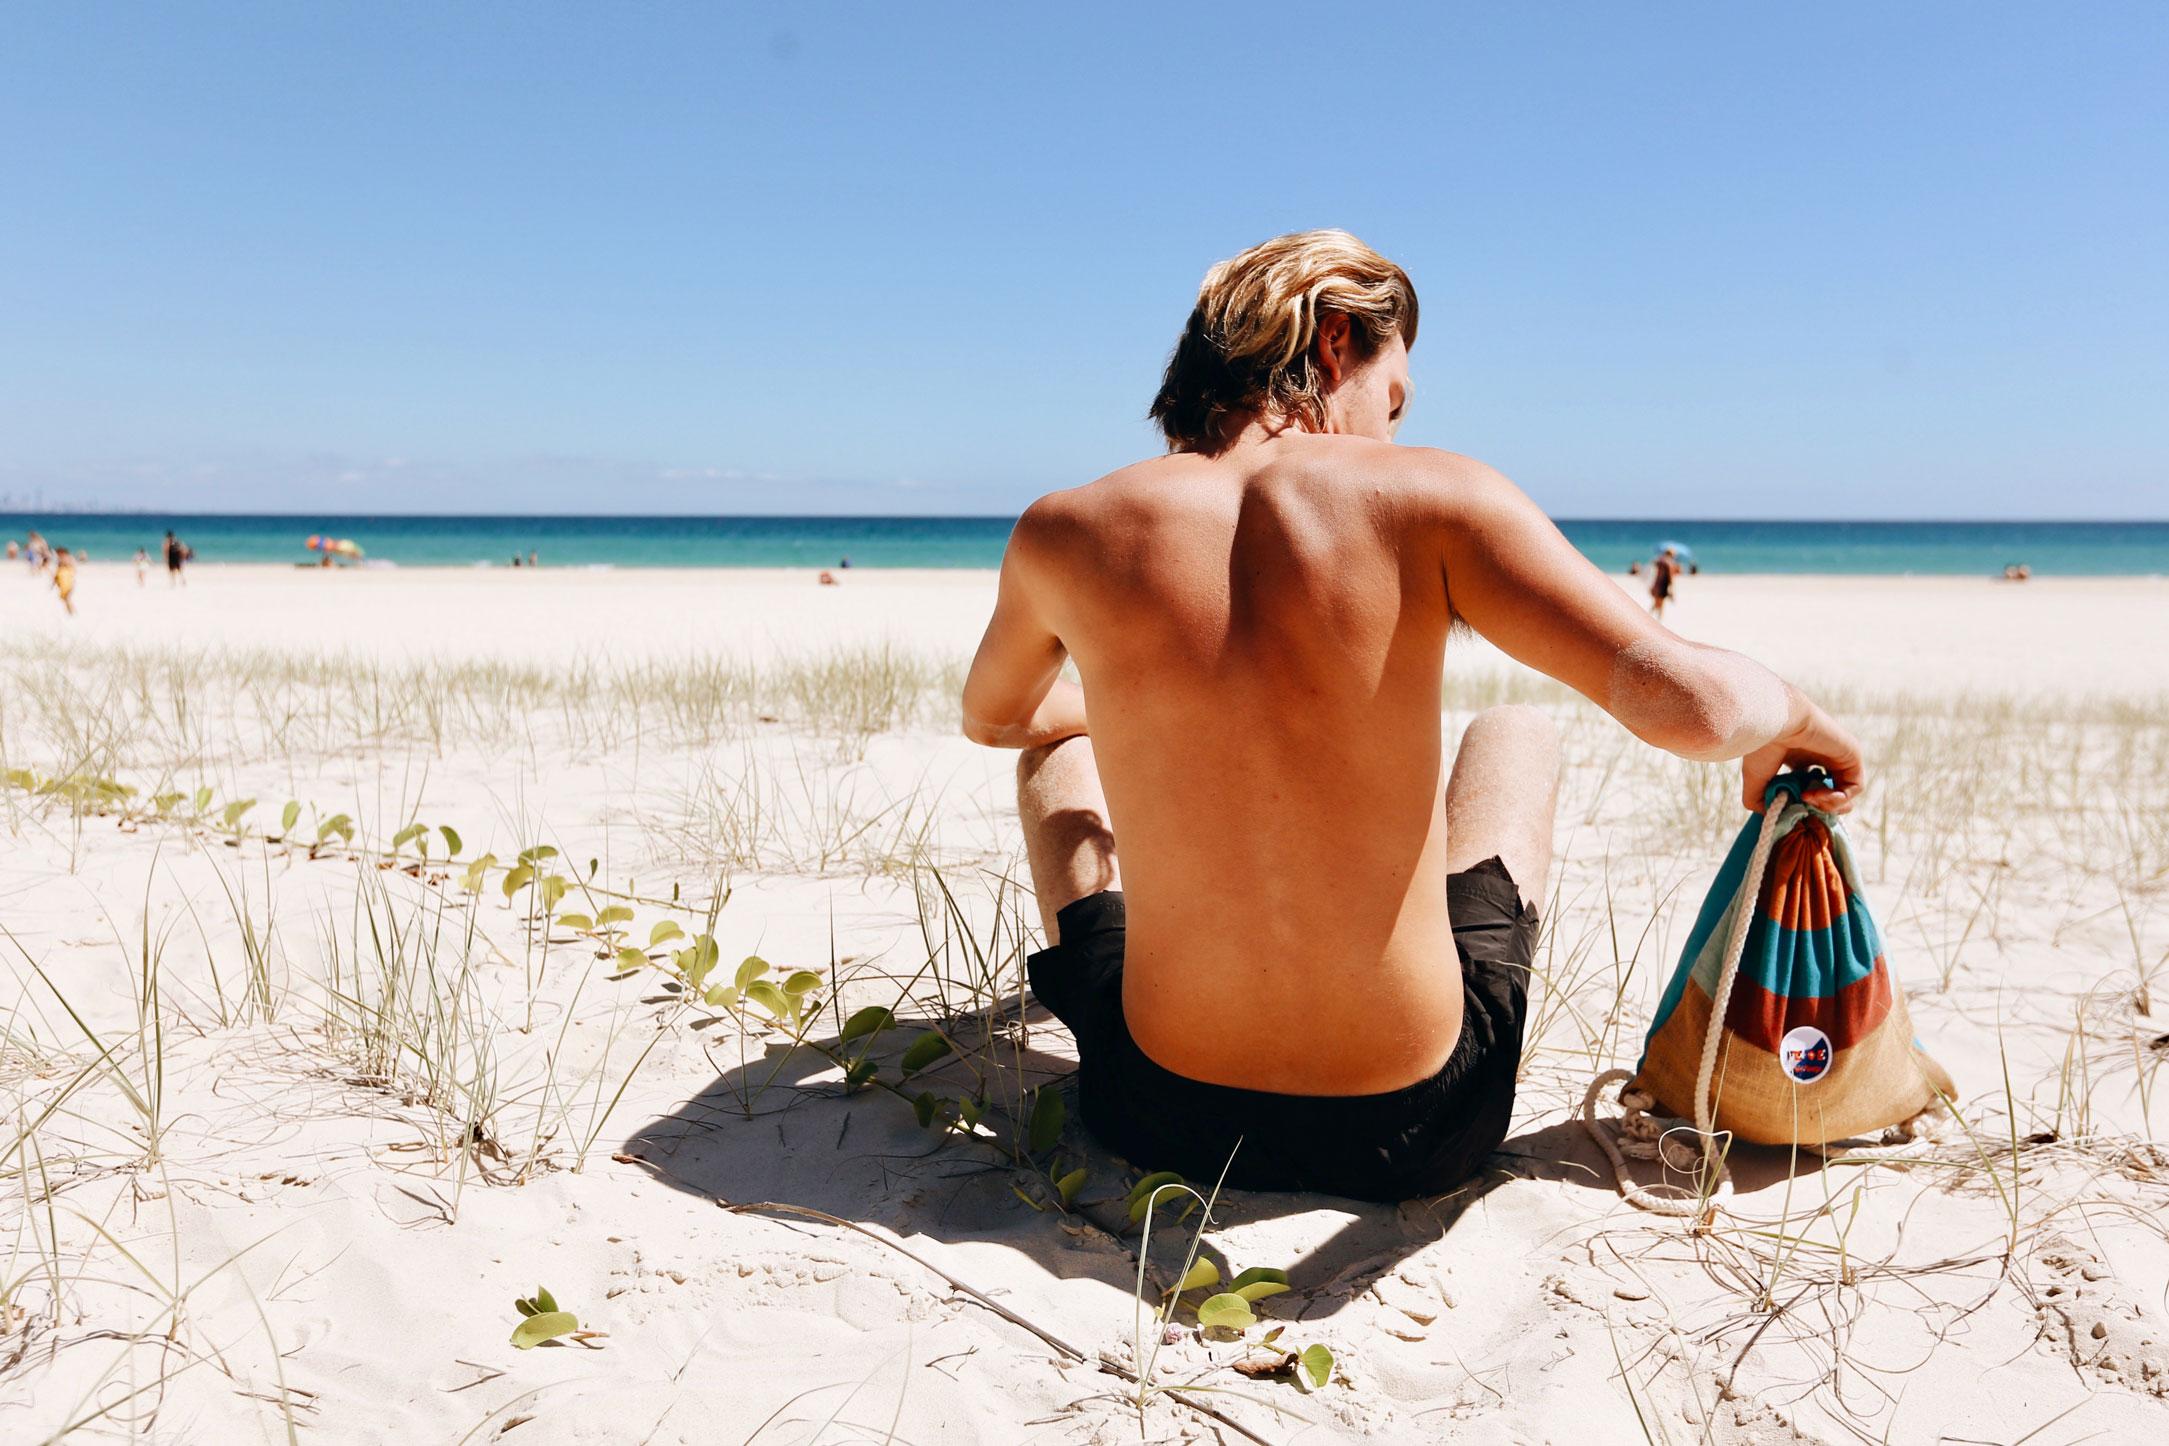 Beach sack by FedeSurfabags